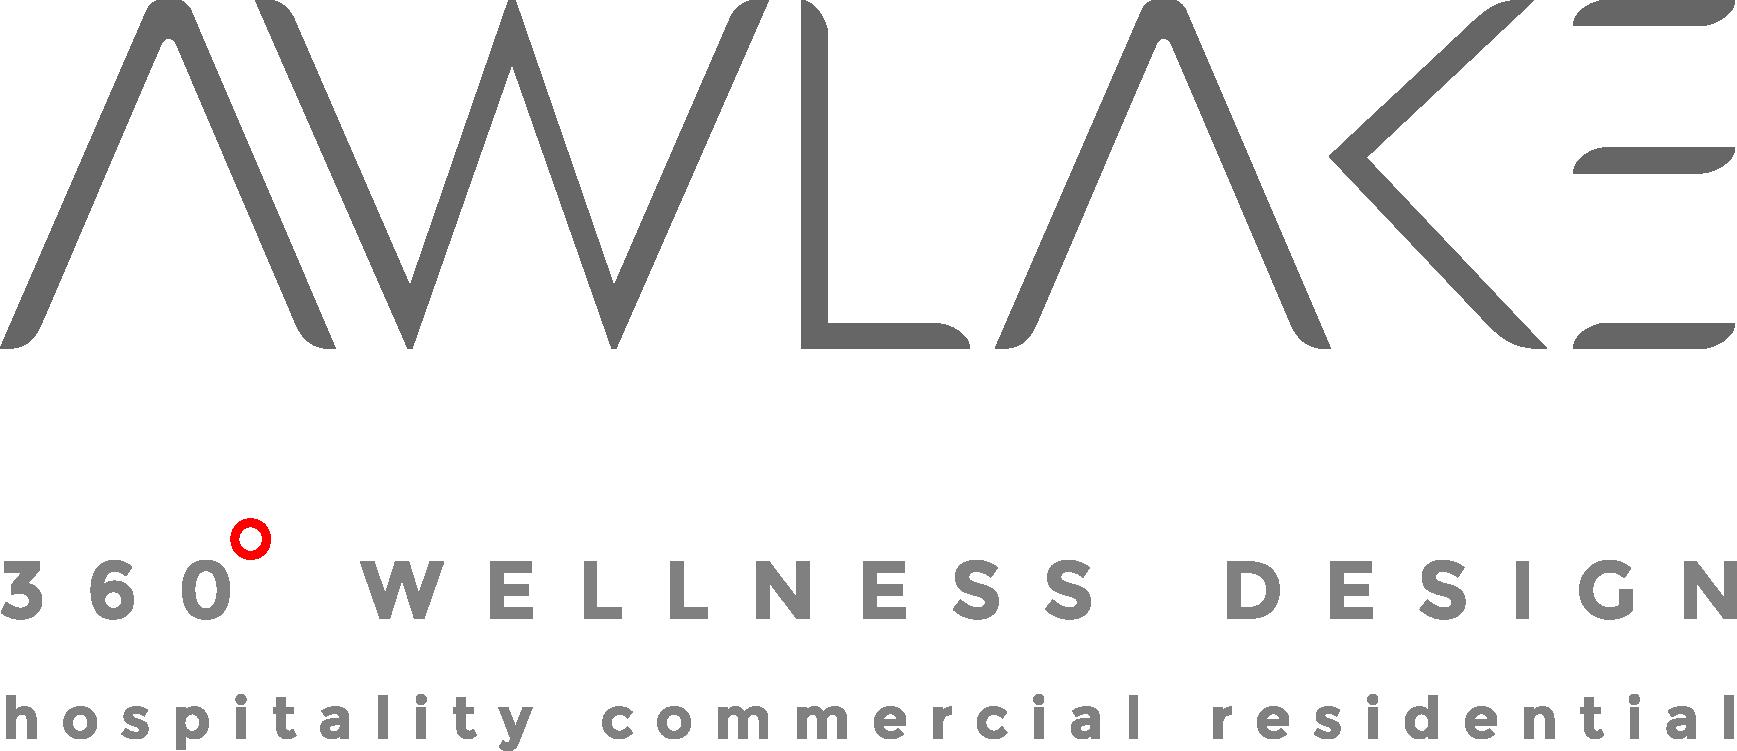 awlake logo